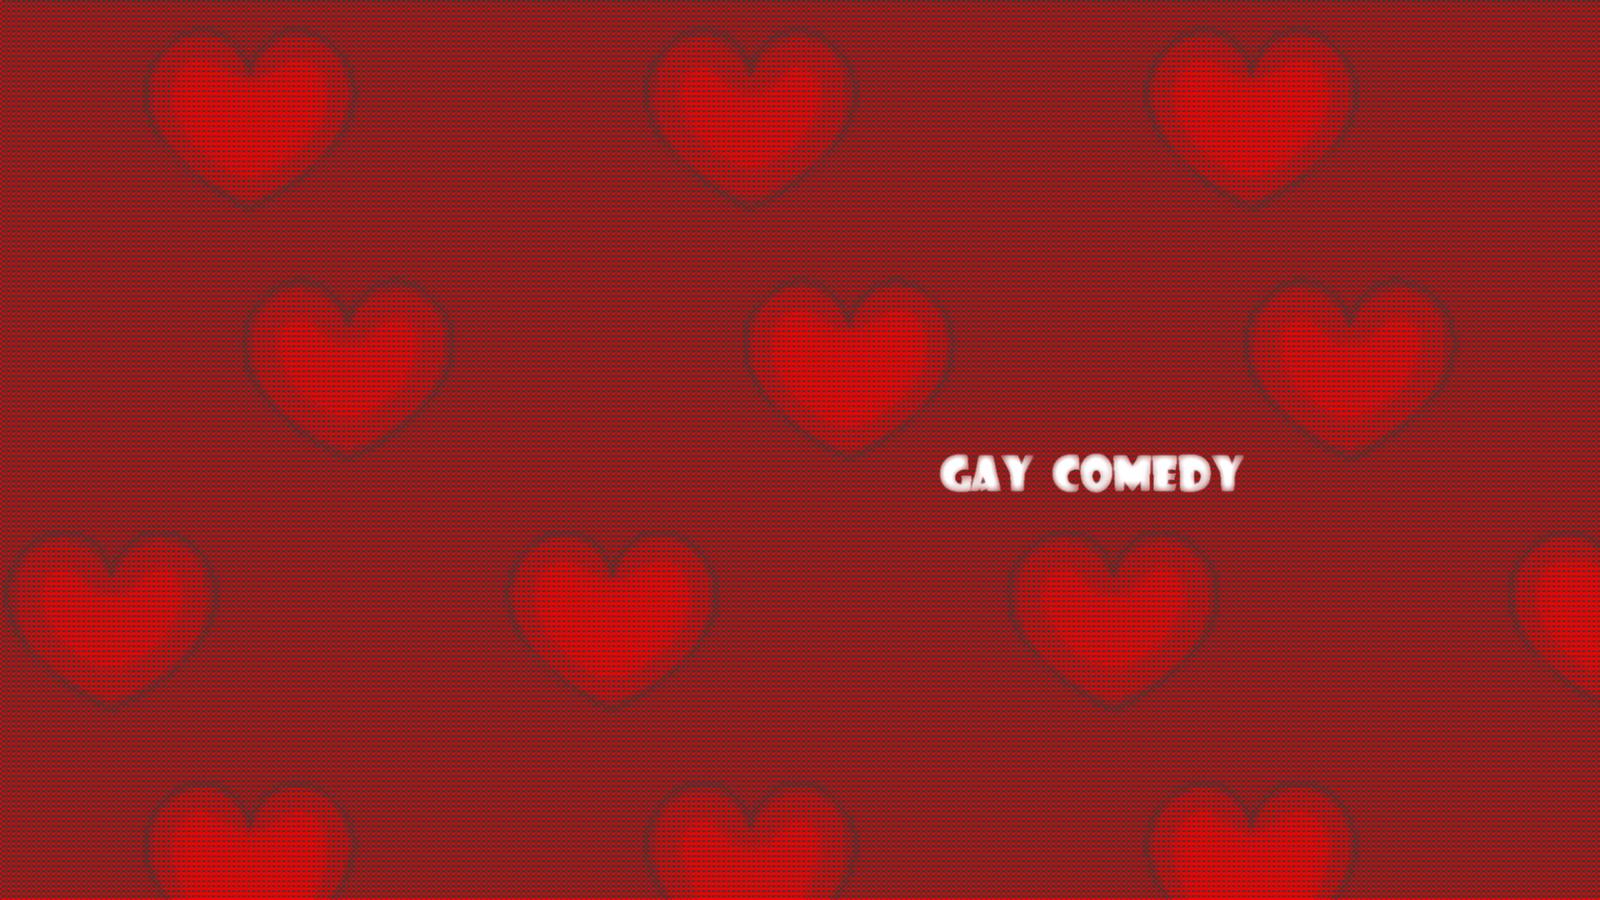 LGBTWALLPAPERSGAYLESBIANPRIDERAINBOWGAYCOMEDY4png 1600x900